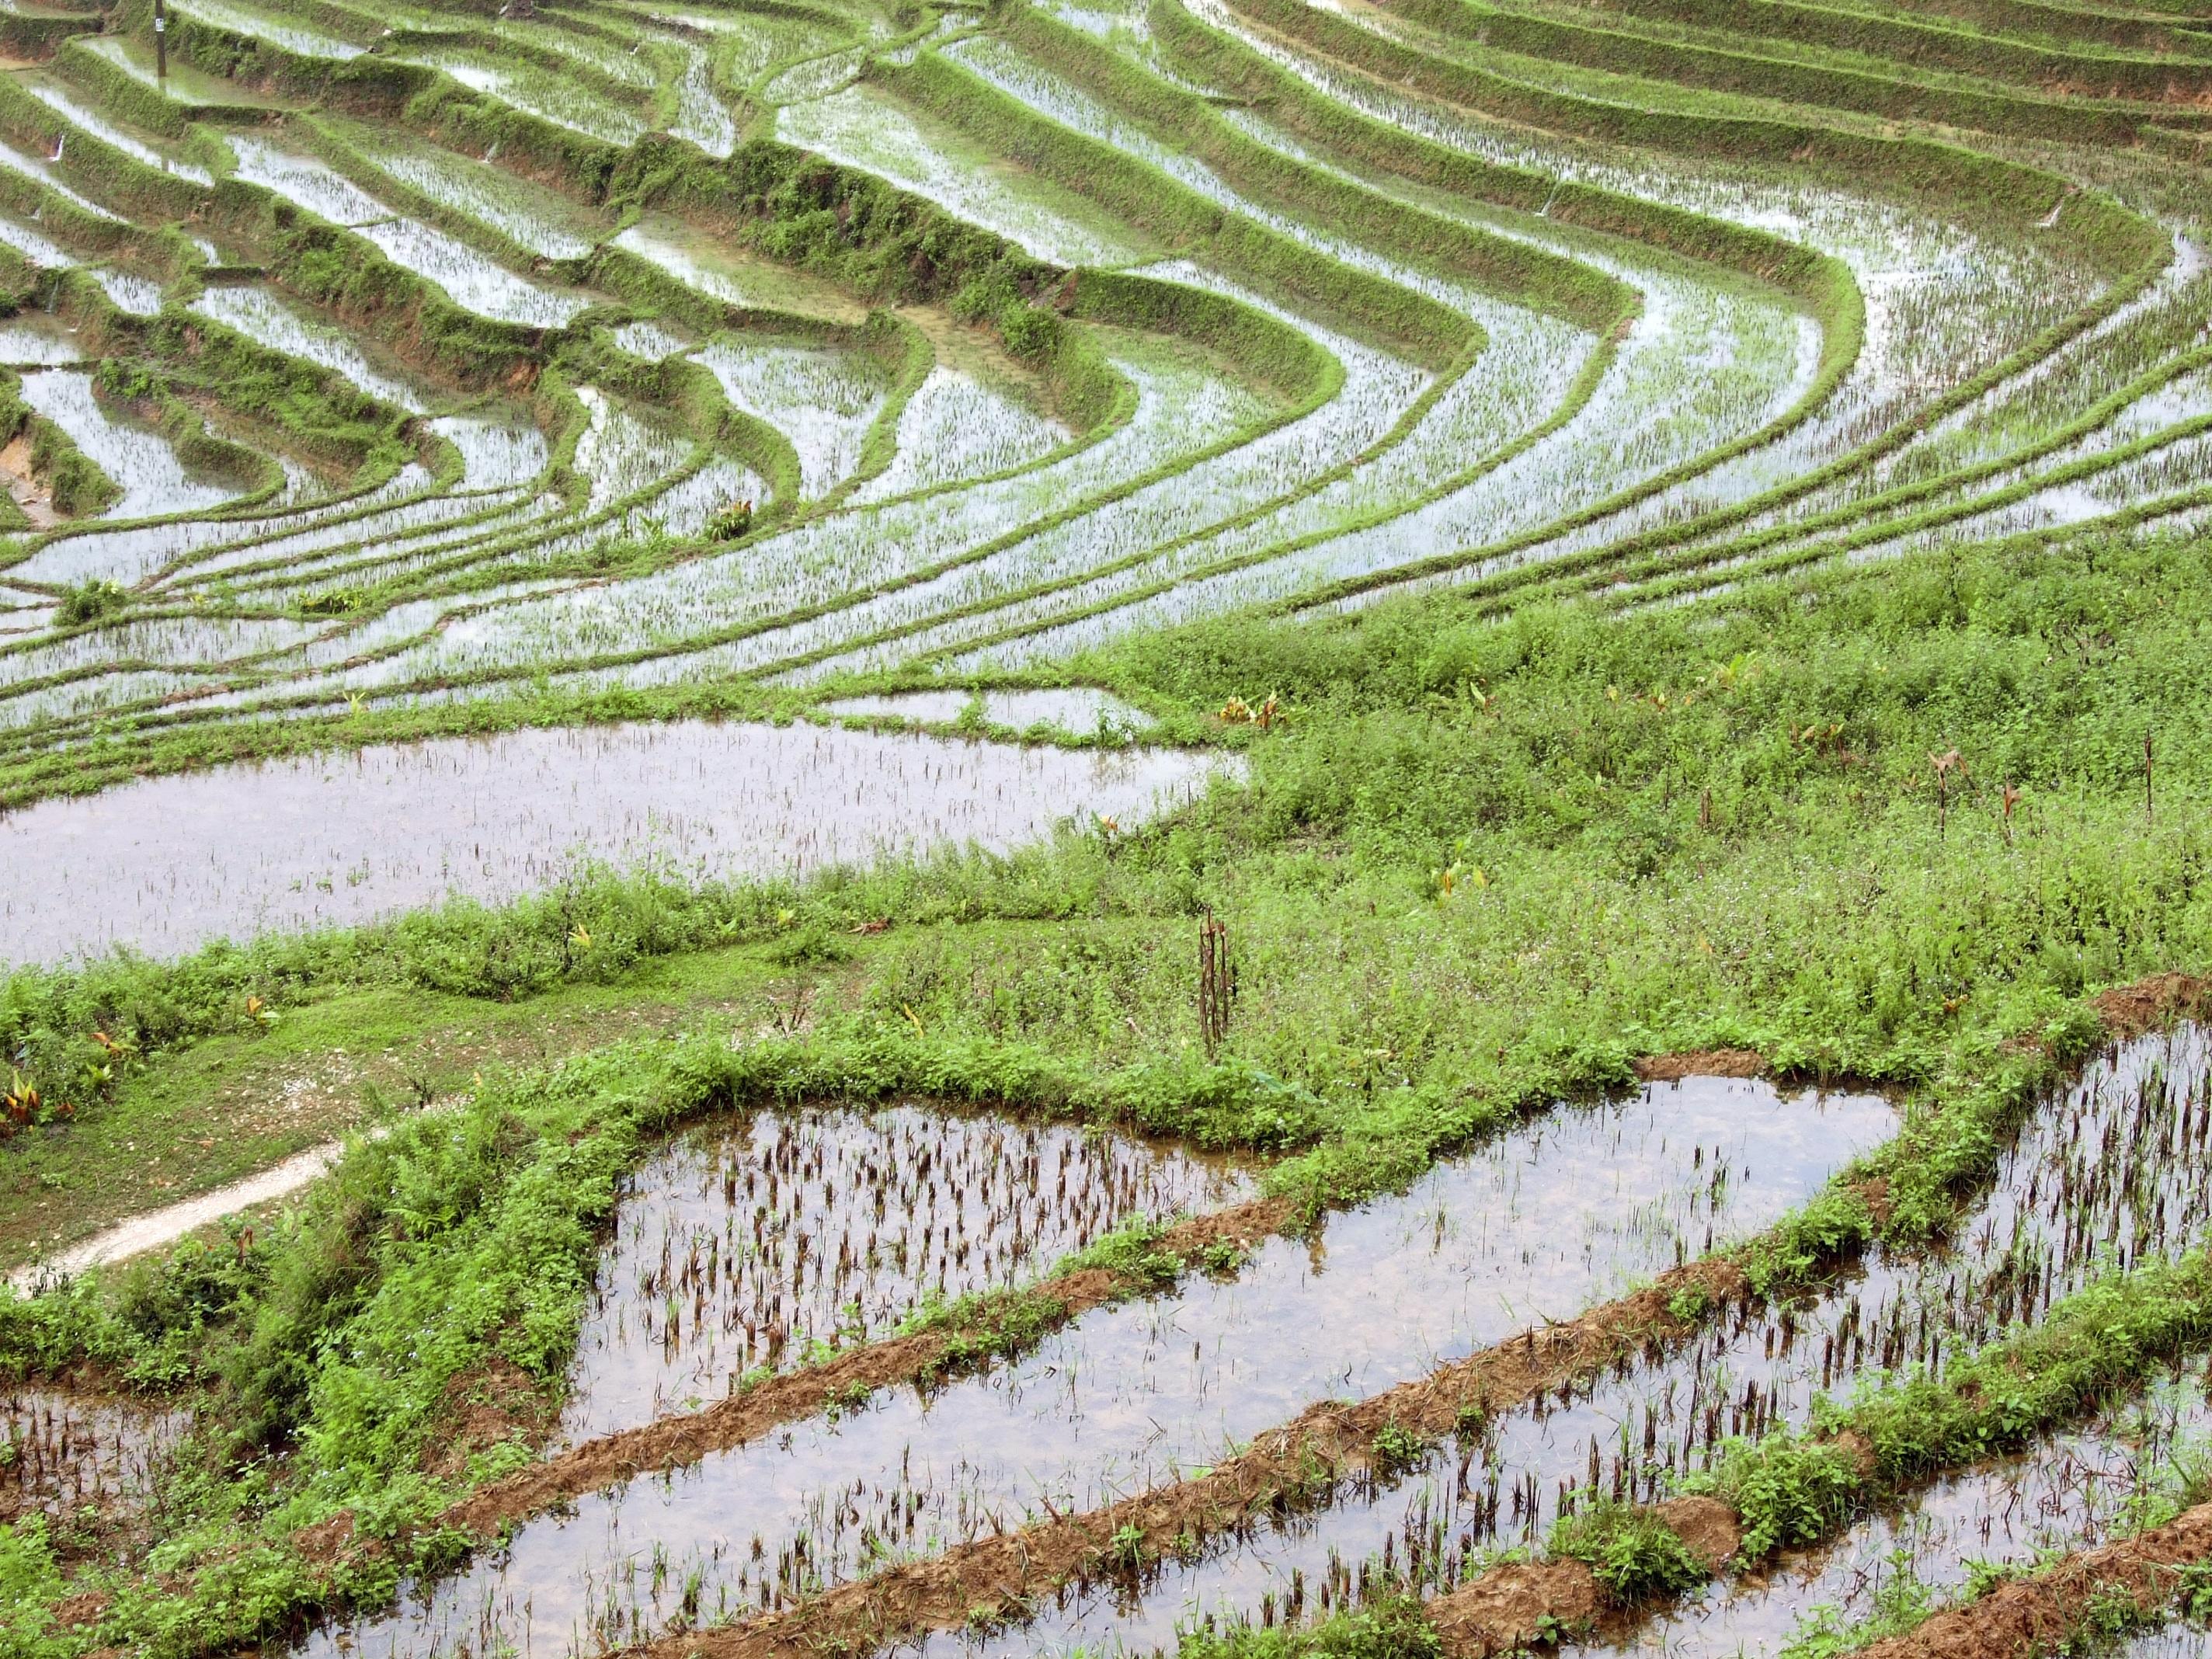 Fotos Gratis Paisaje Viajar Cultivo Suelo Asia